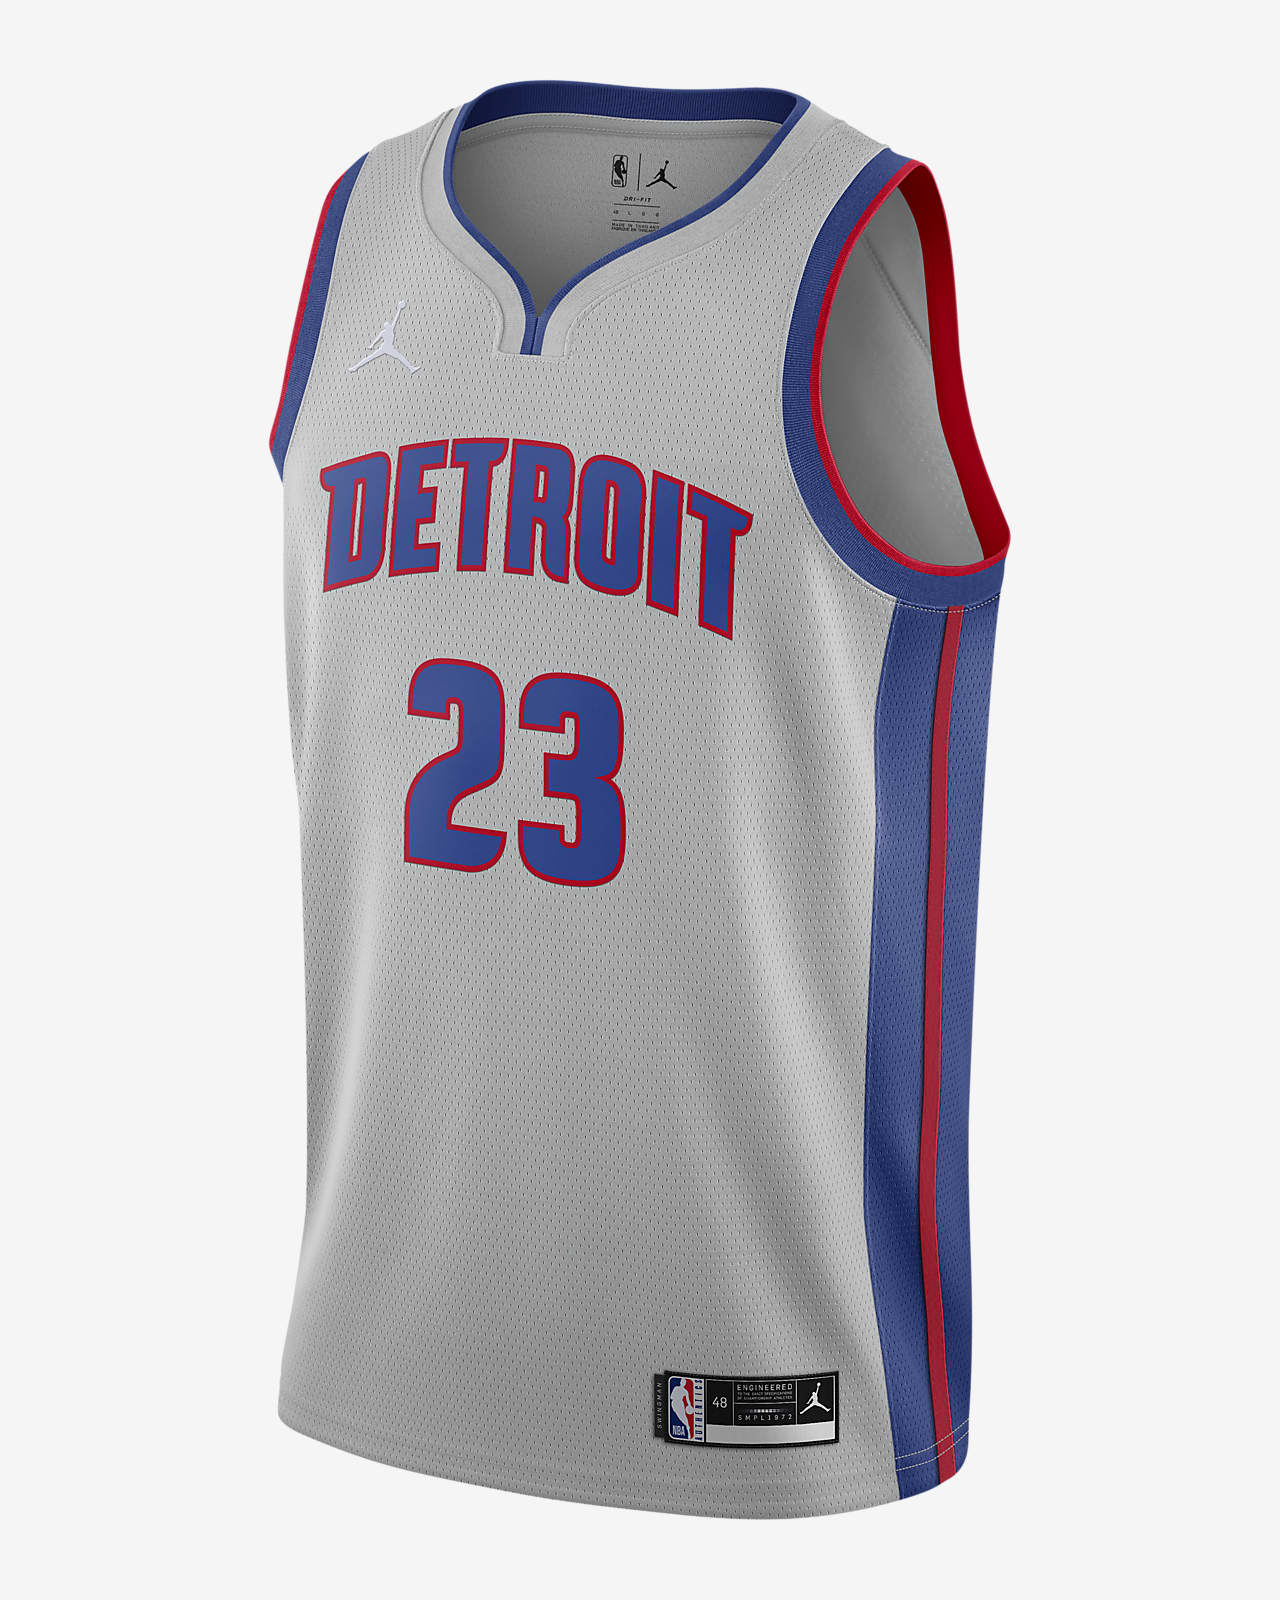 Detroit Pistons Pistons Statement Edition 2020 Jordan NBA Swingman Jersey